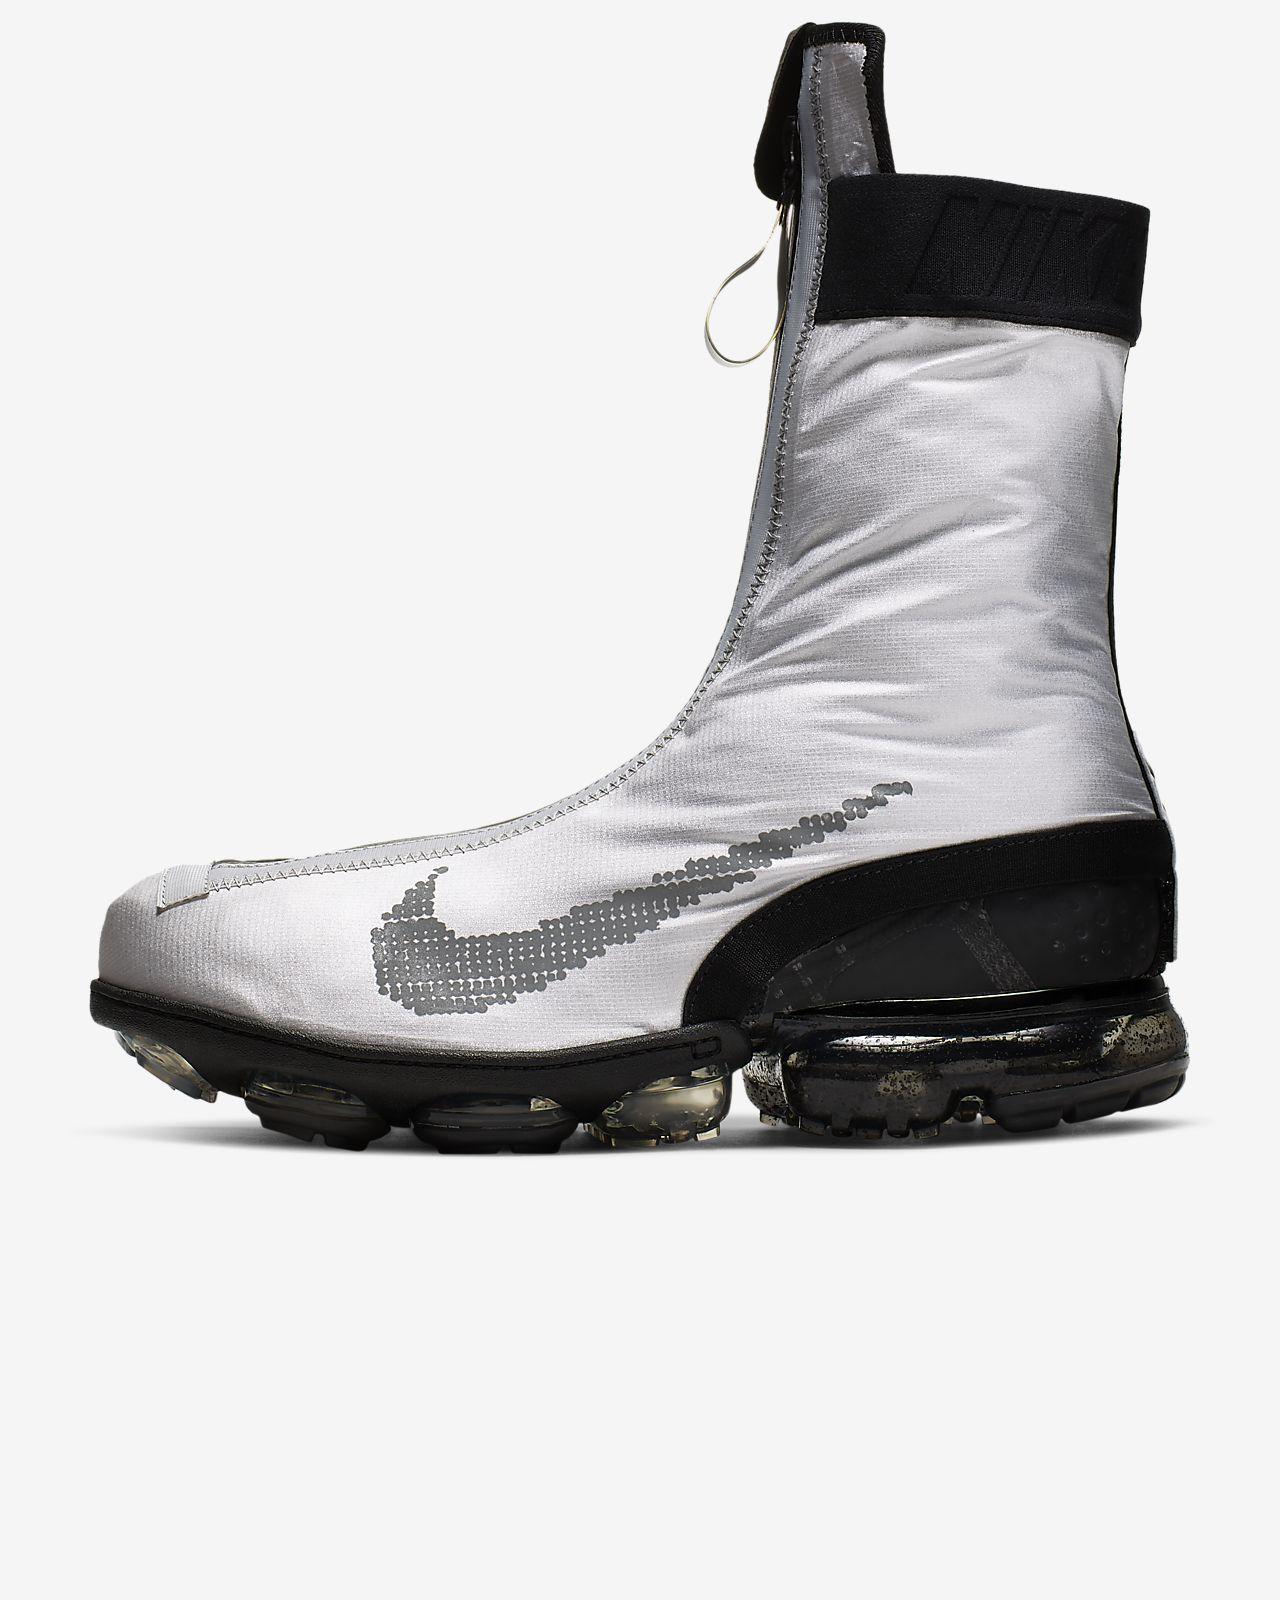 Nike Air VaporMax FlyKnit Gaiter ISPA Schuh